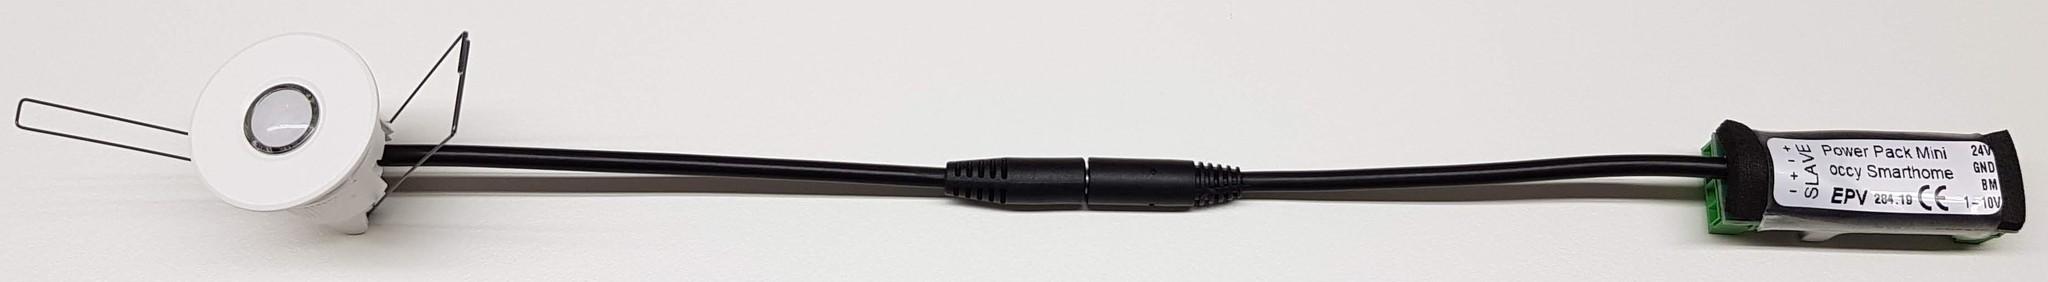 Präsenzmelder occy smarthome 24V sensorkopf und mini Powerpack